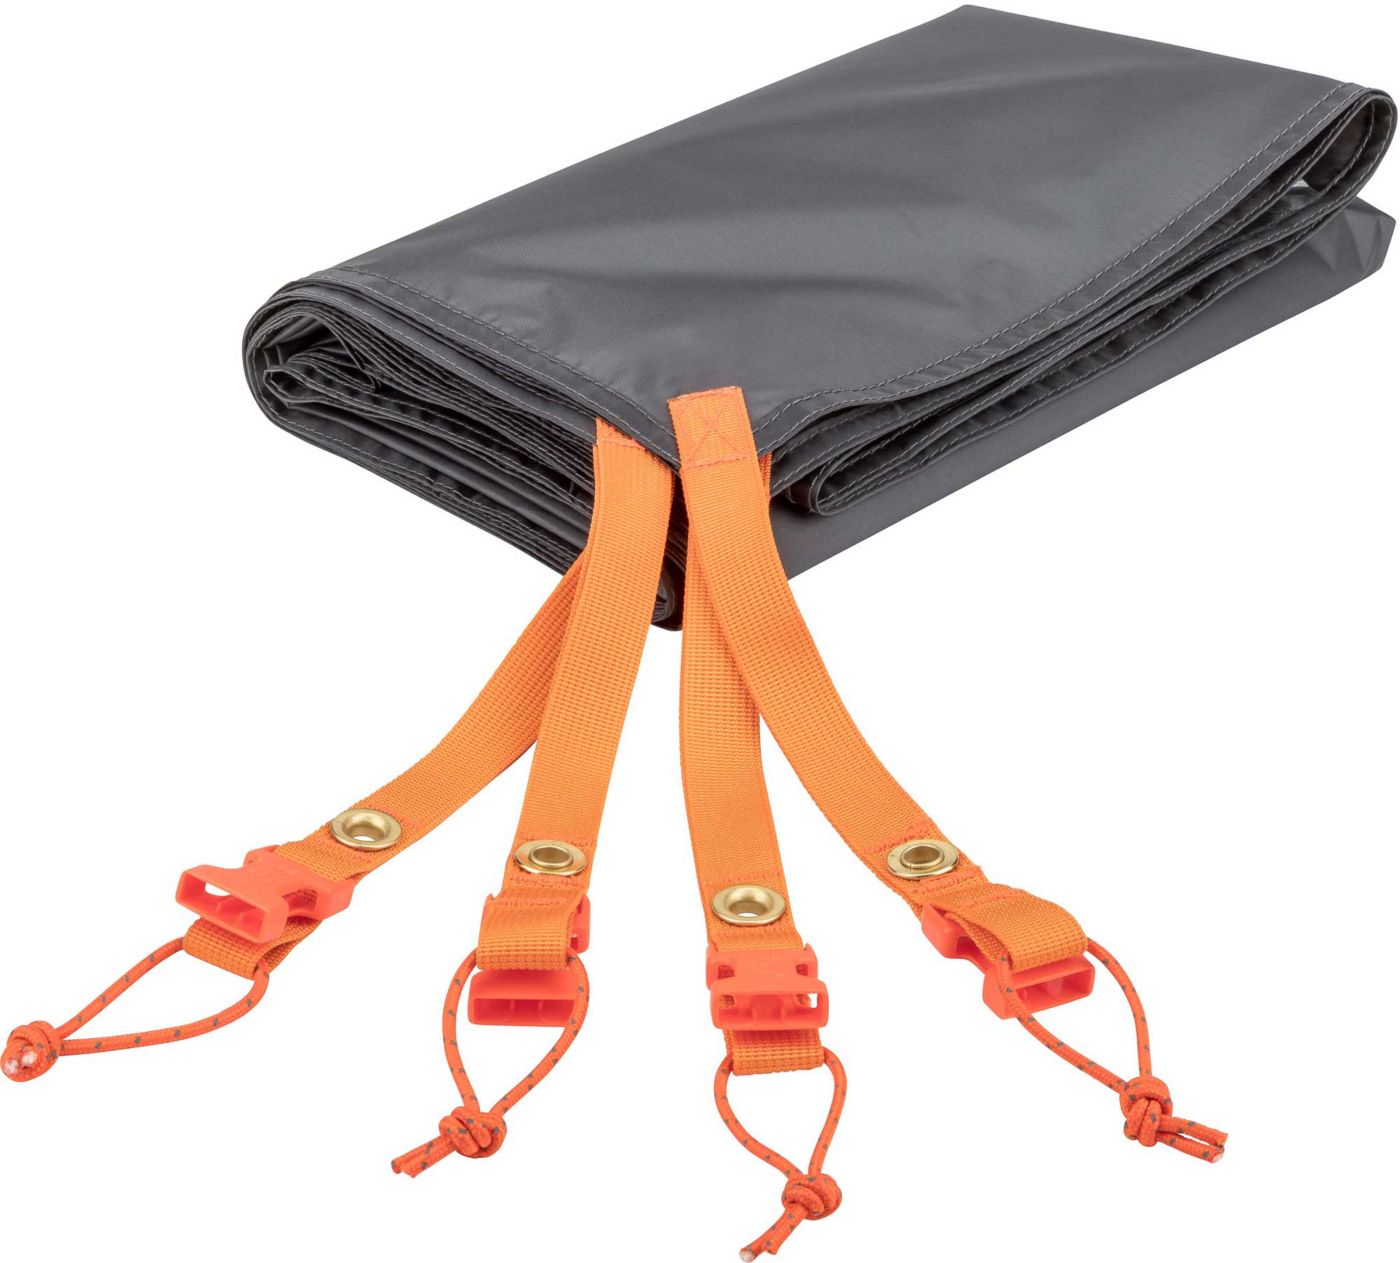 Marmot Limelight 3-Person Ultralight Tent Footprint